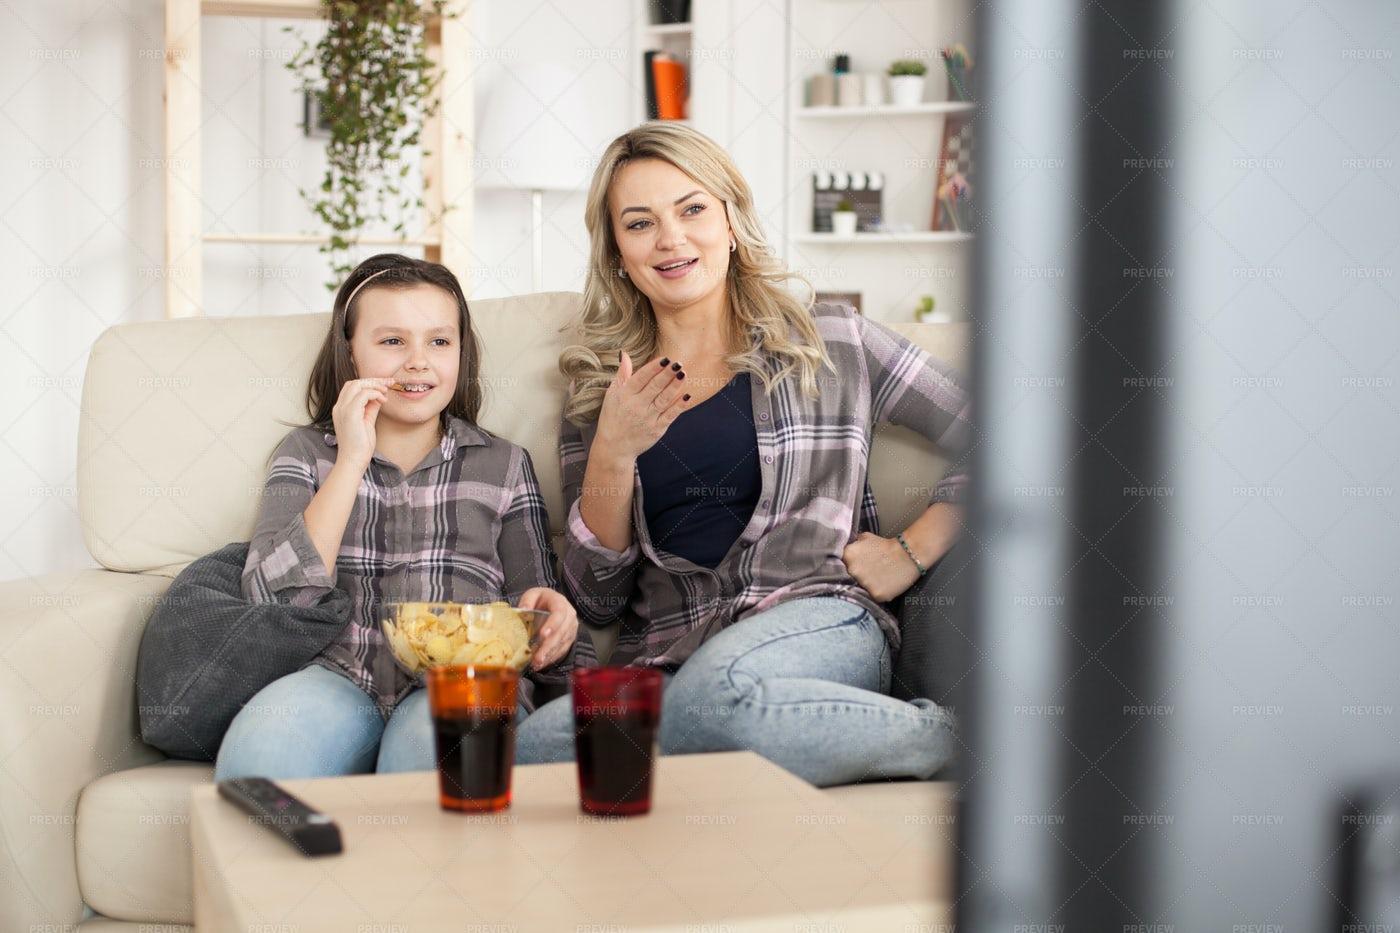 Mother And Daughter Watching TV: Stock Photos